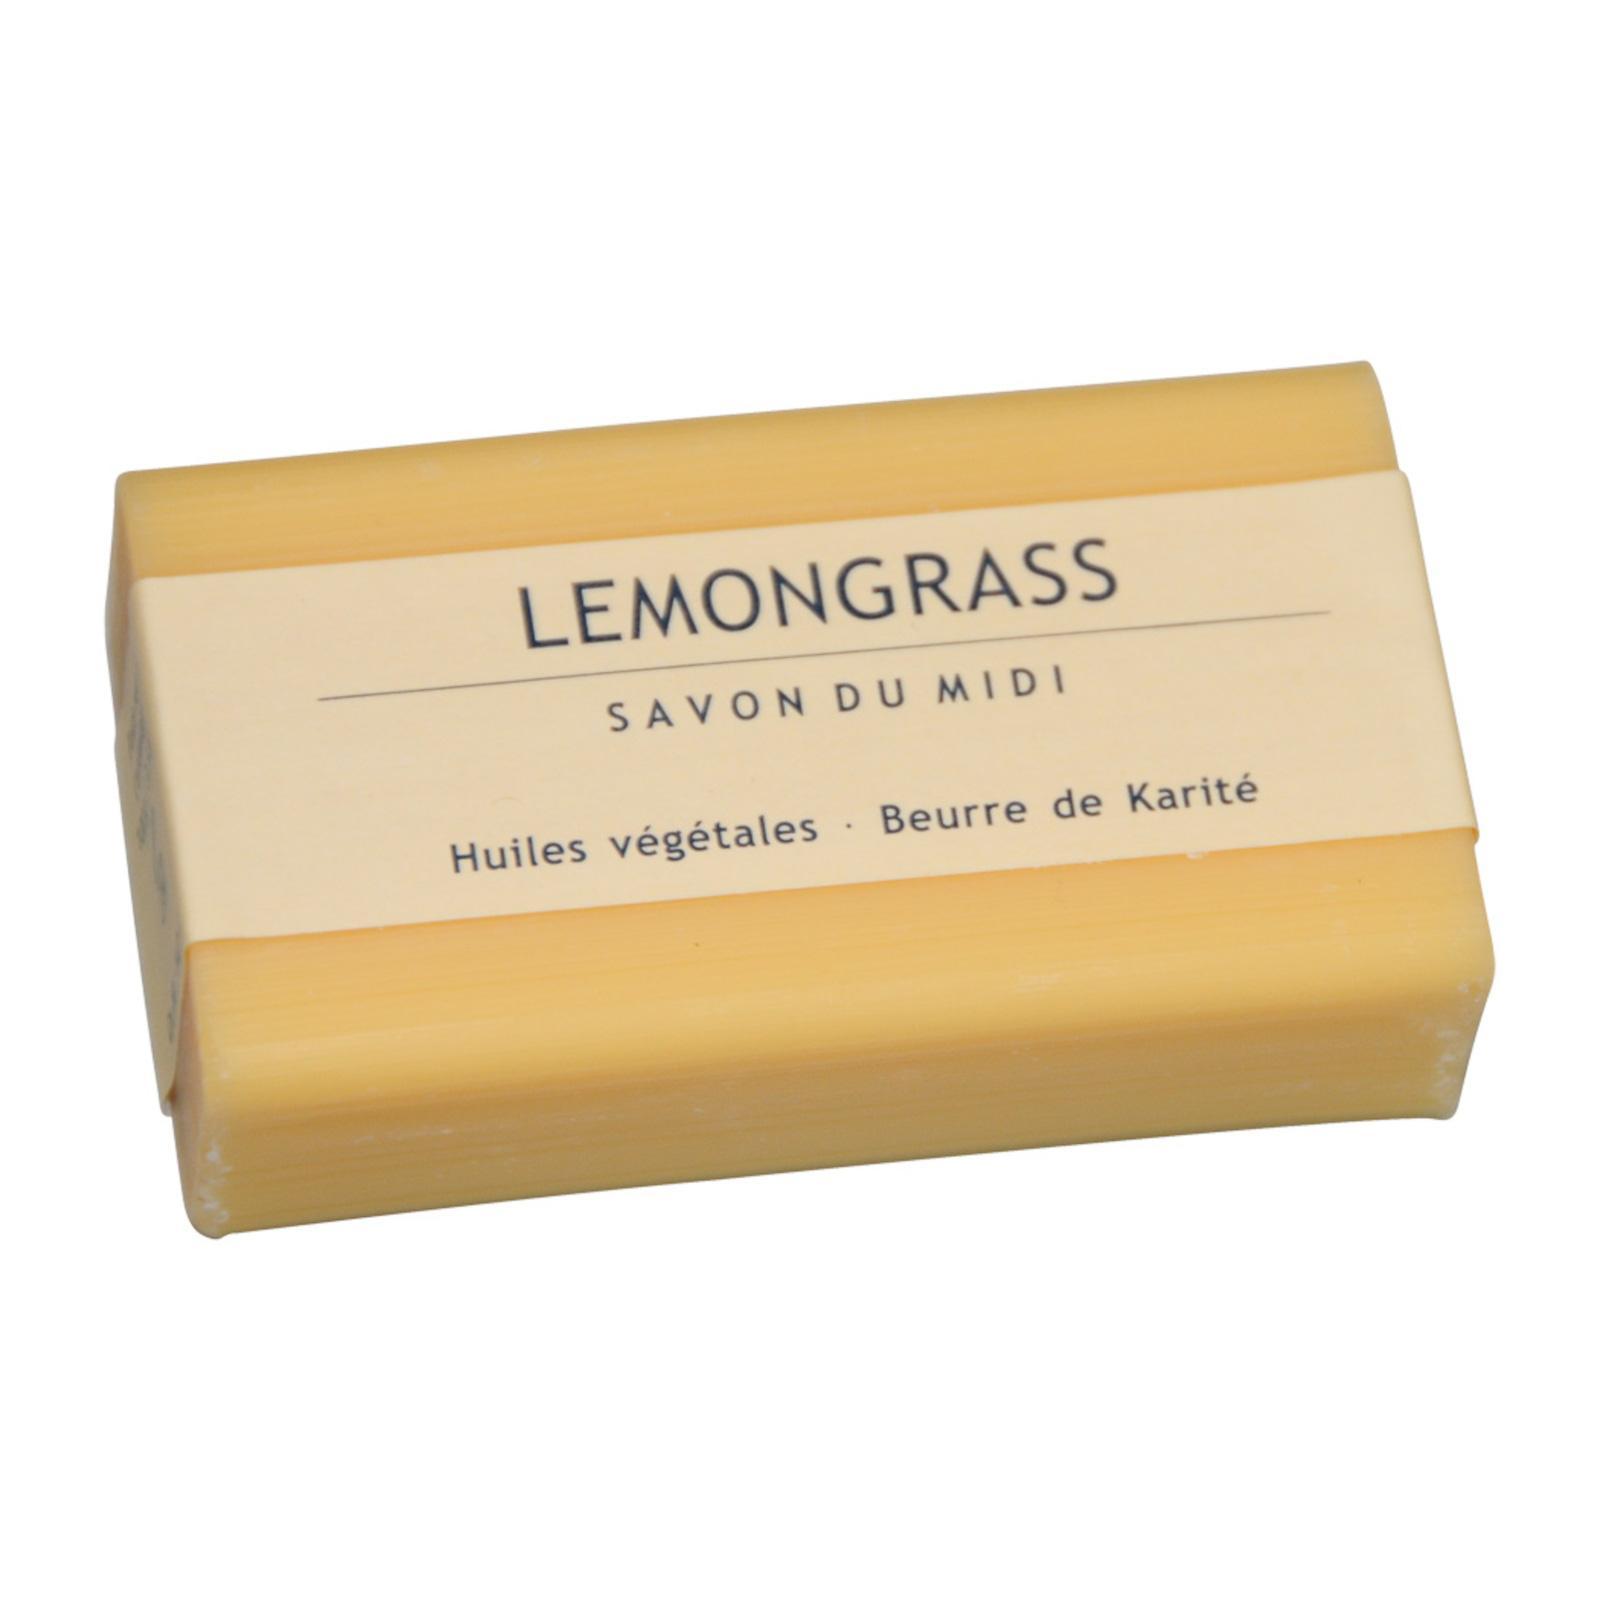 Savon Du Midi Mýdlo Lemongrass 100 g